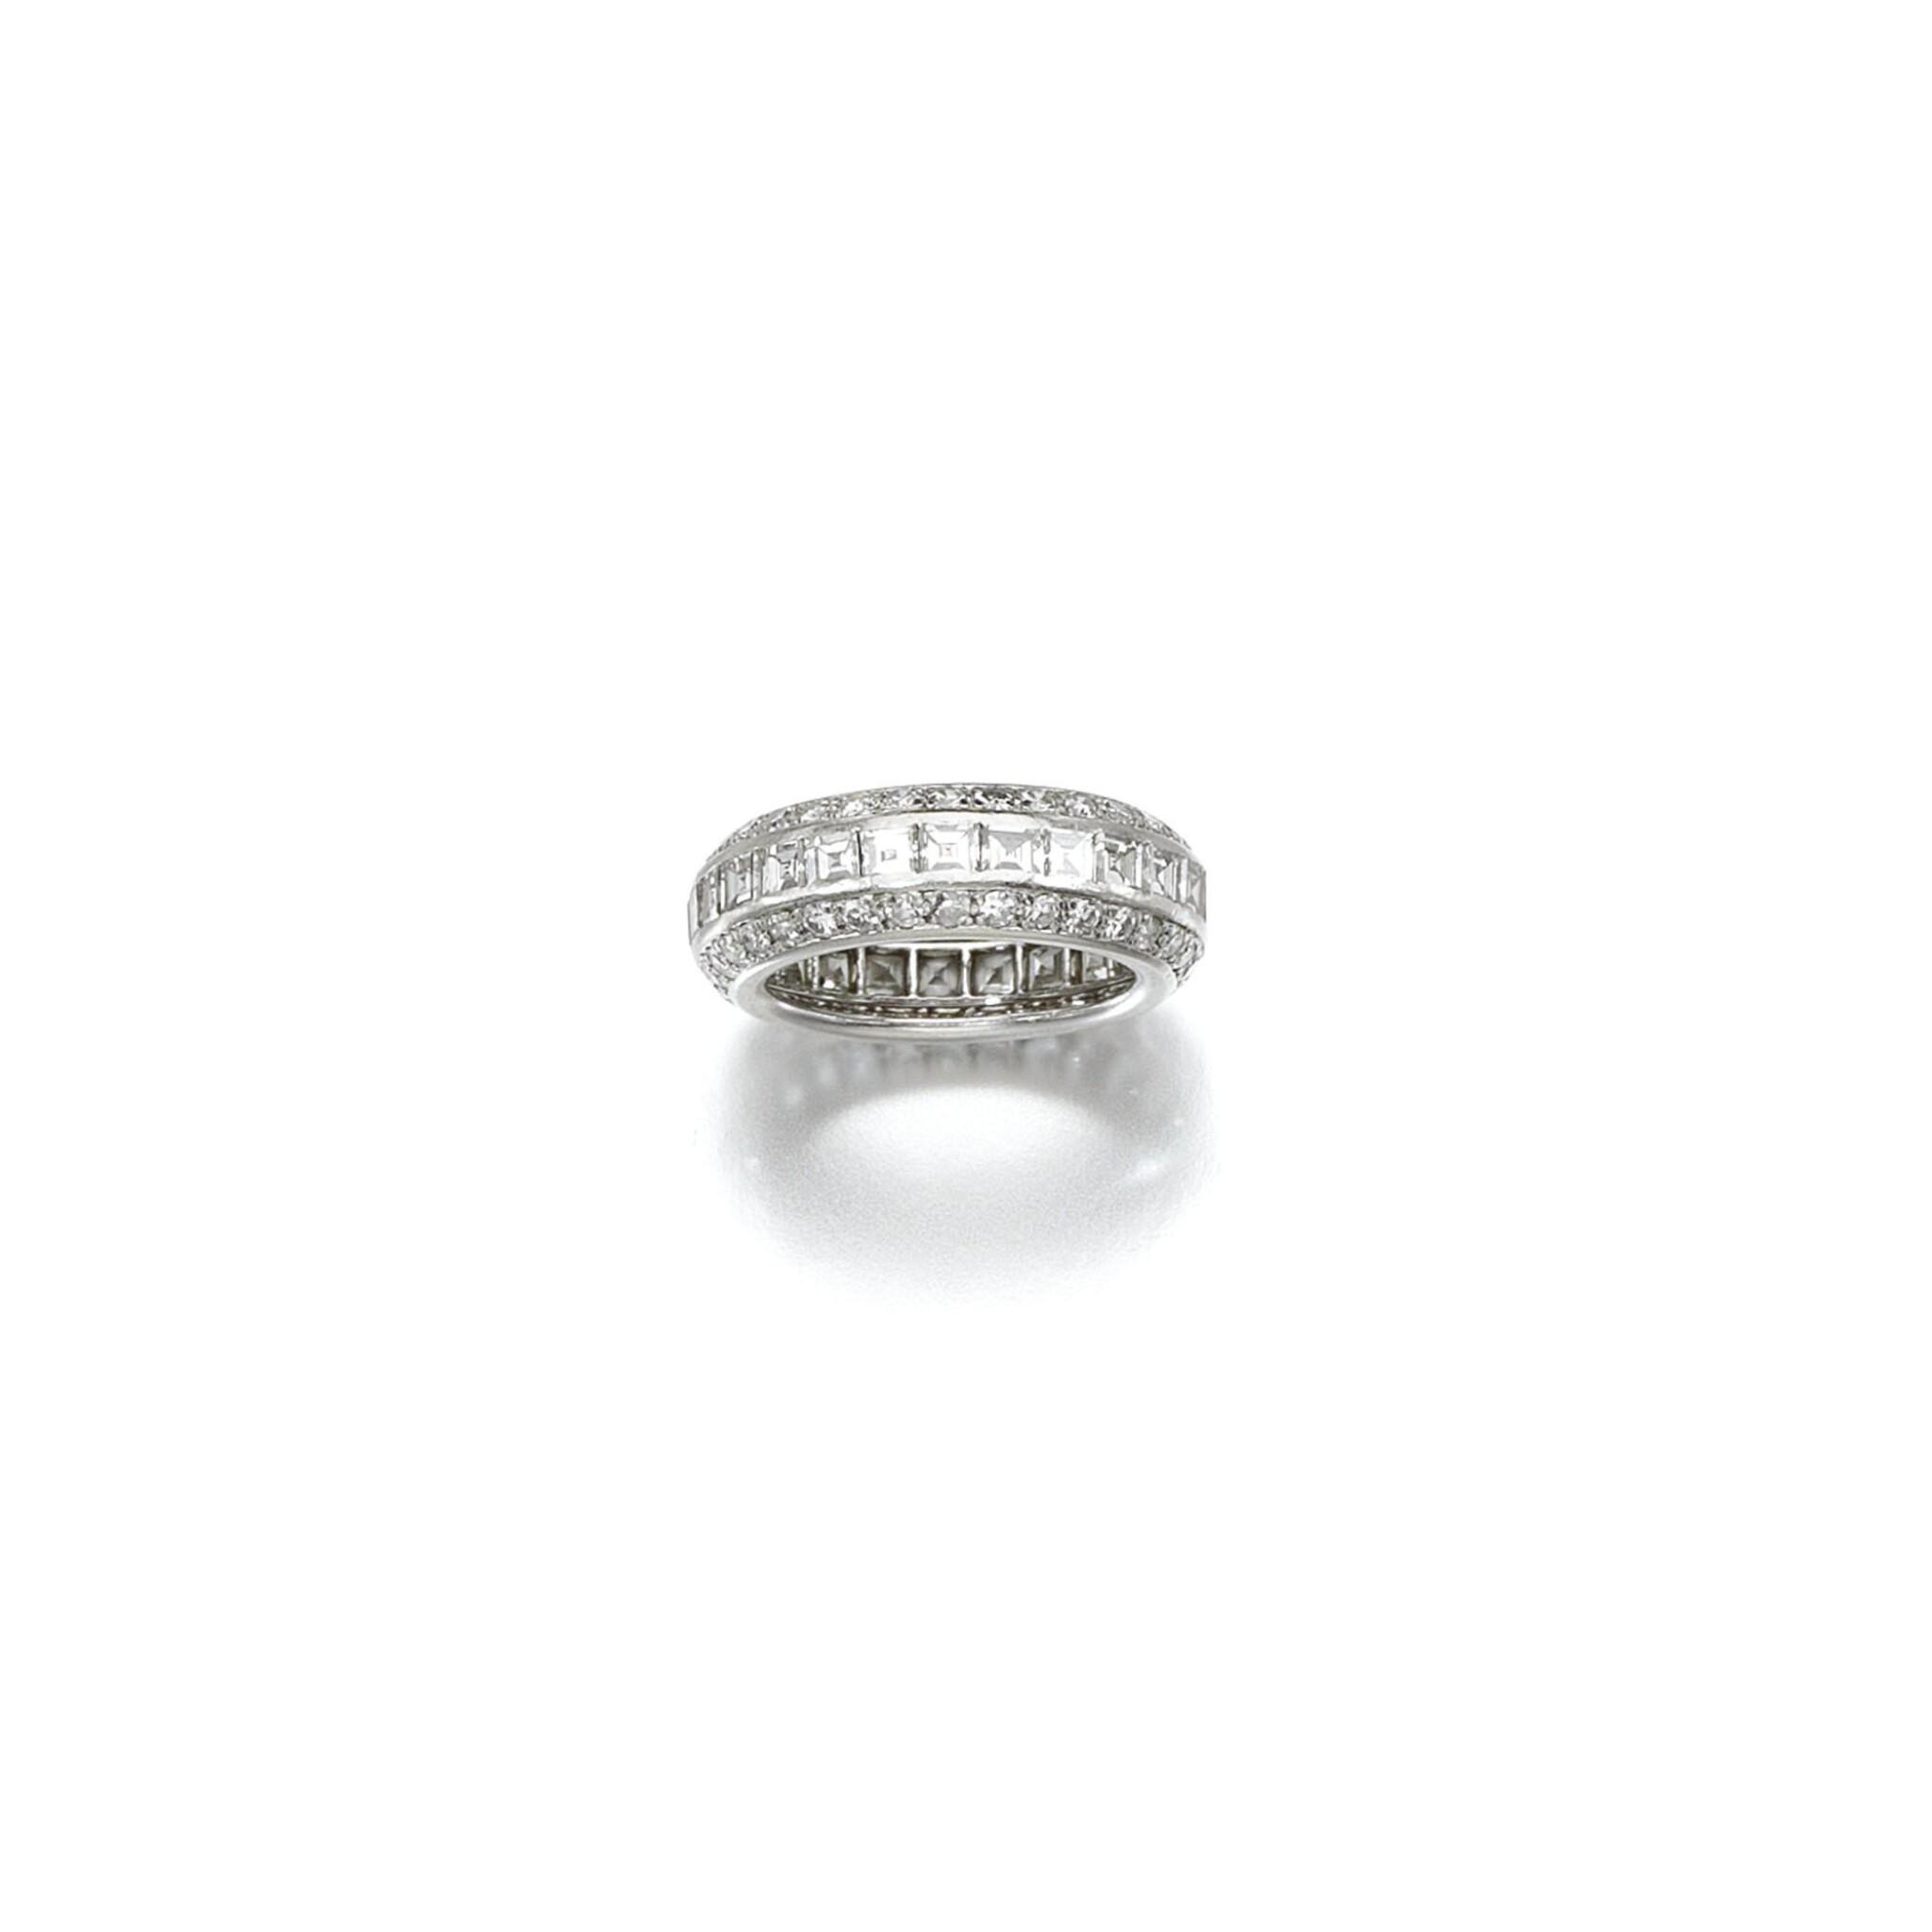 DIAMOND RING, 1930S